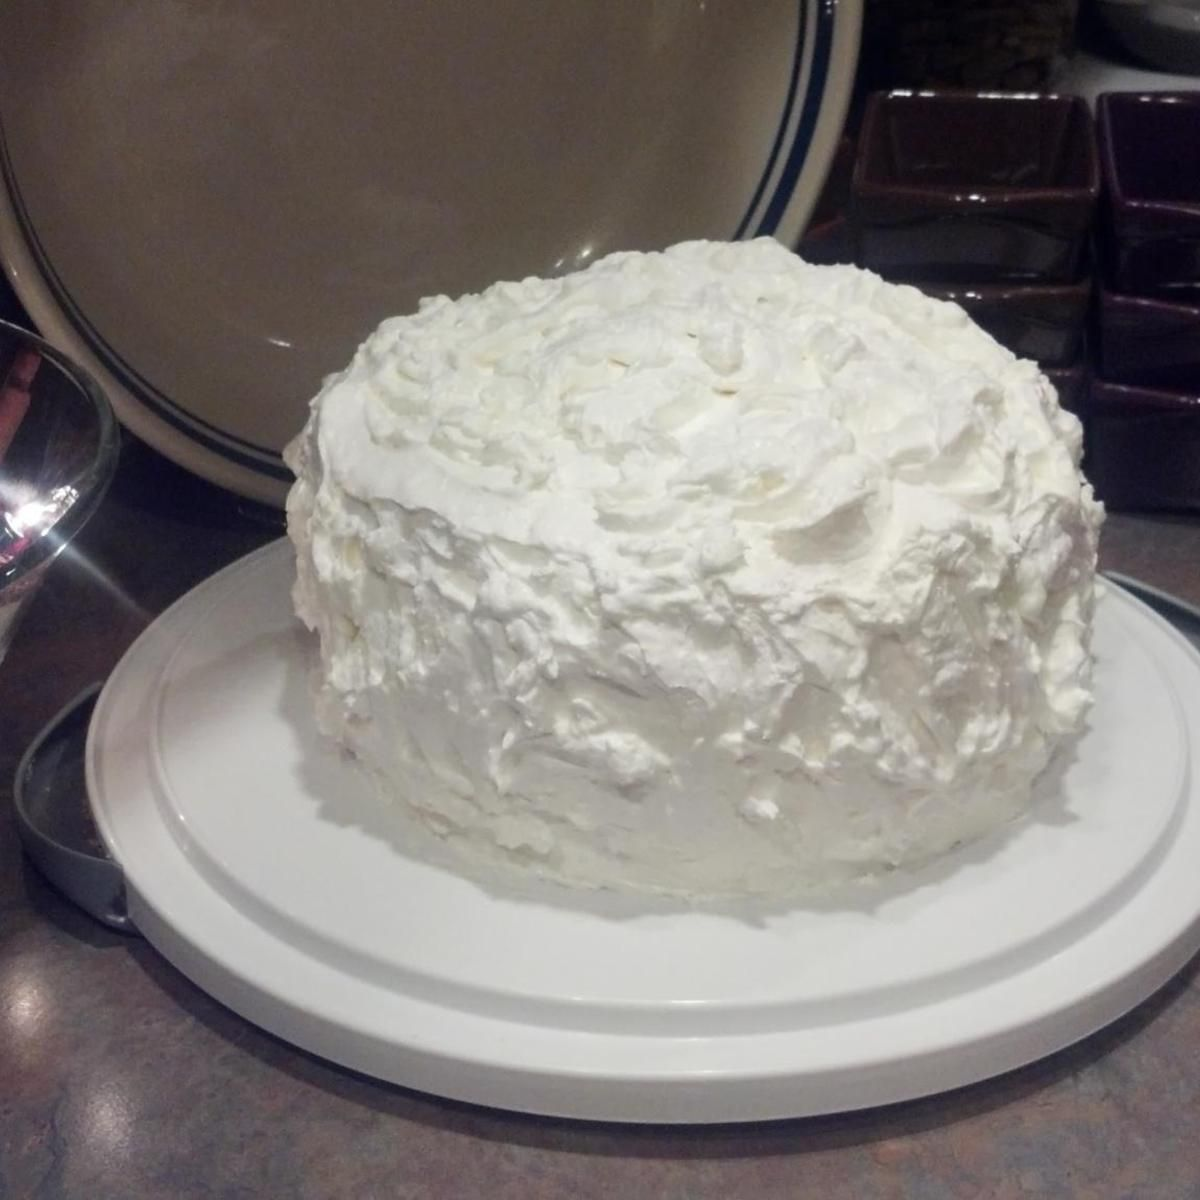 Sour Cream Coconut Cake Sour Cream Coconut Cake Coconut Cake Recipe Coconut Cake